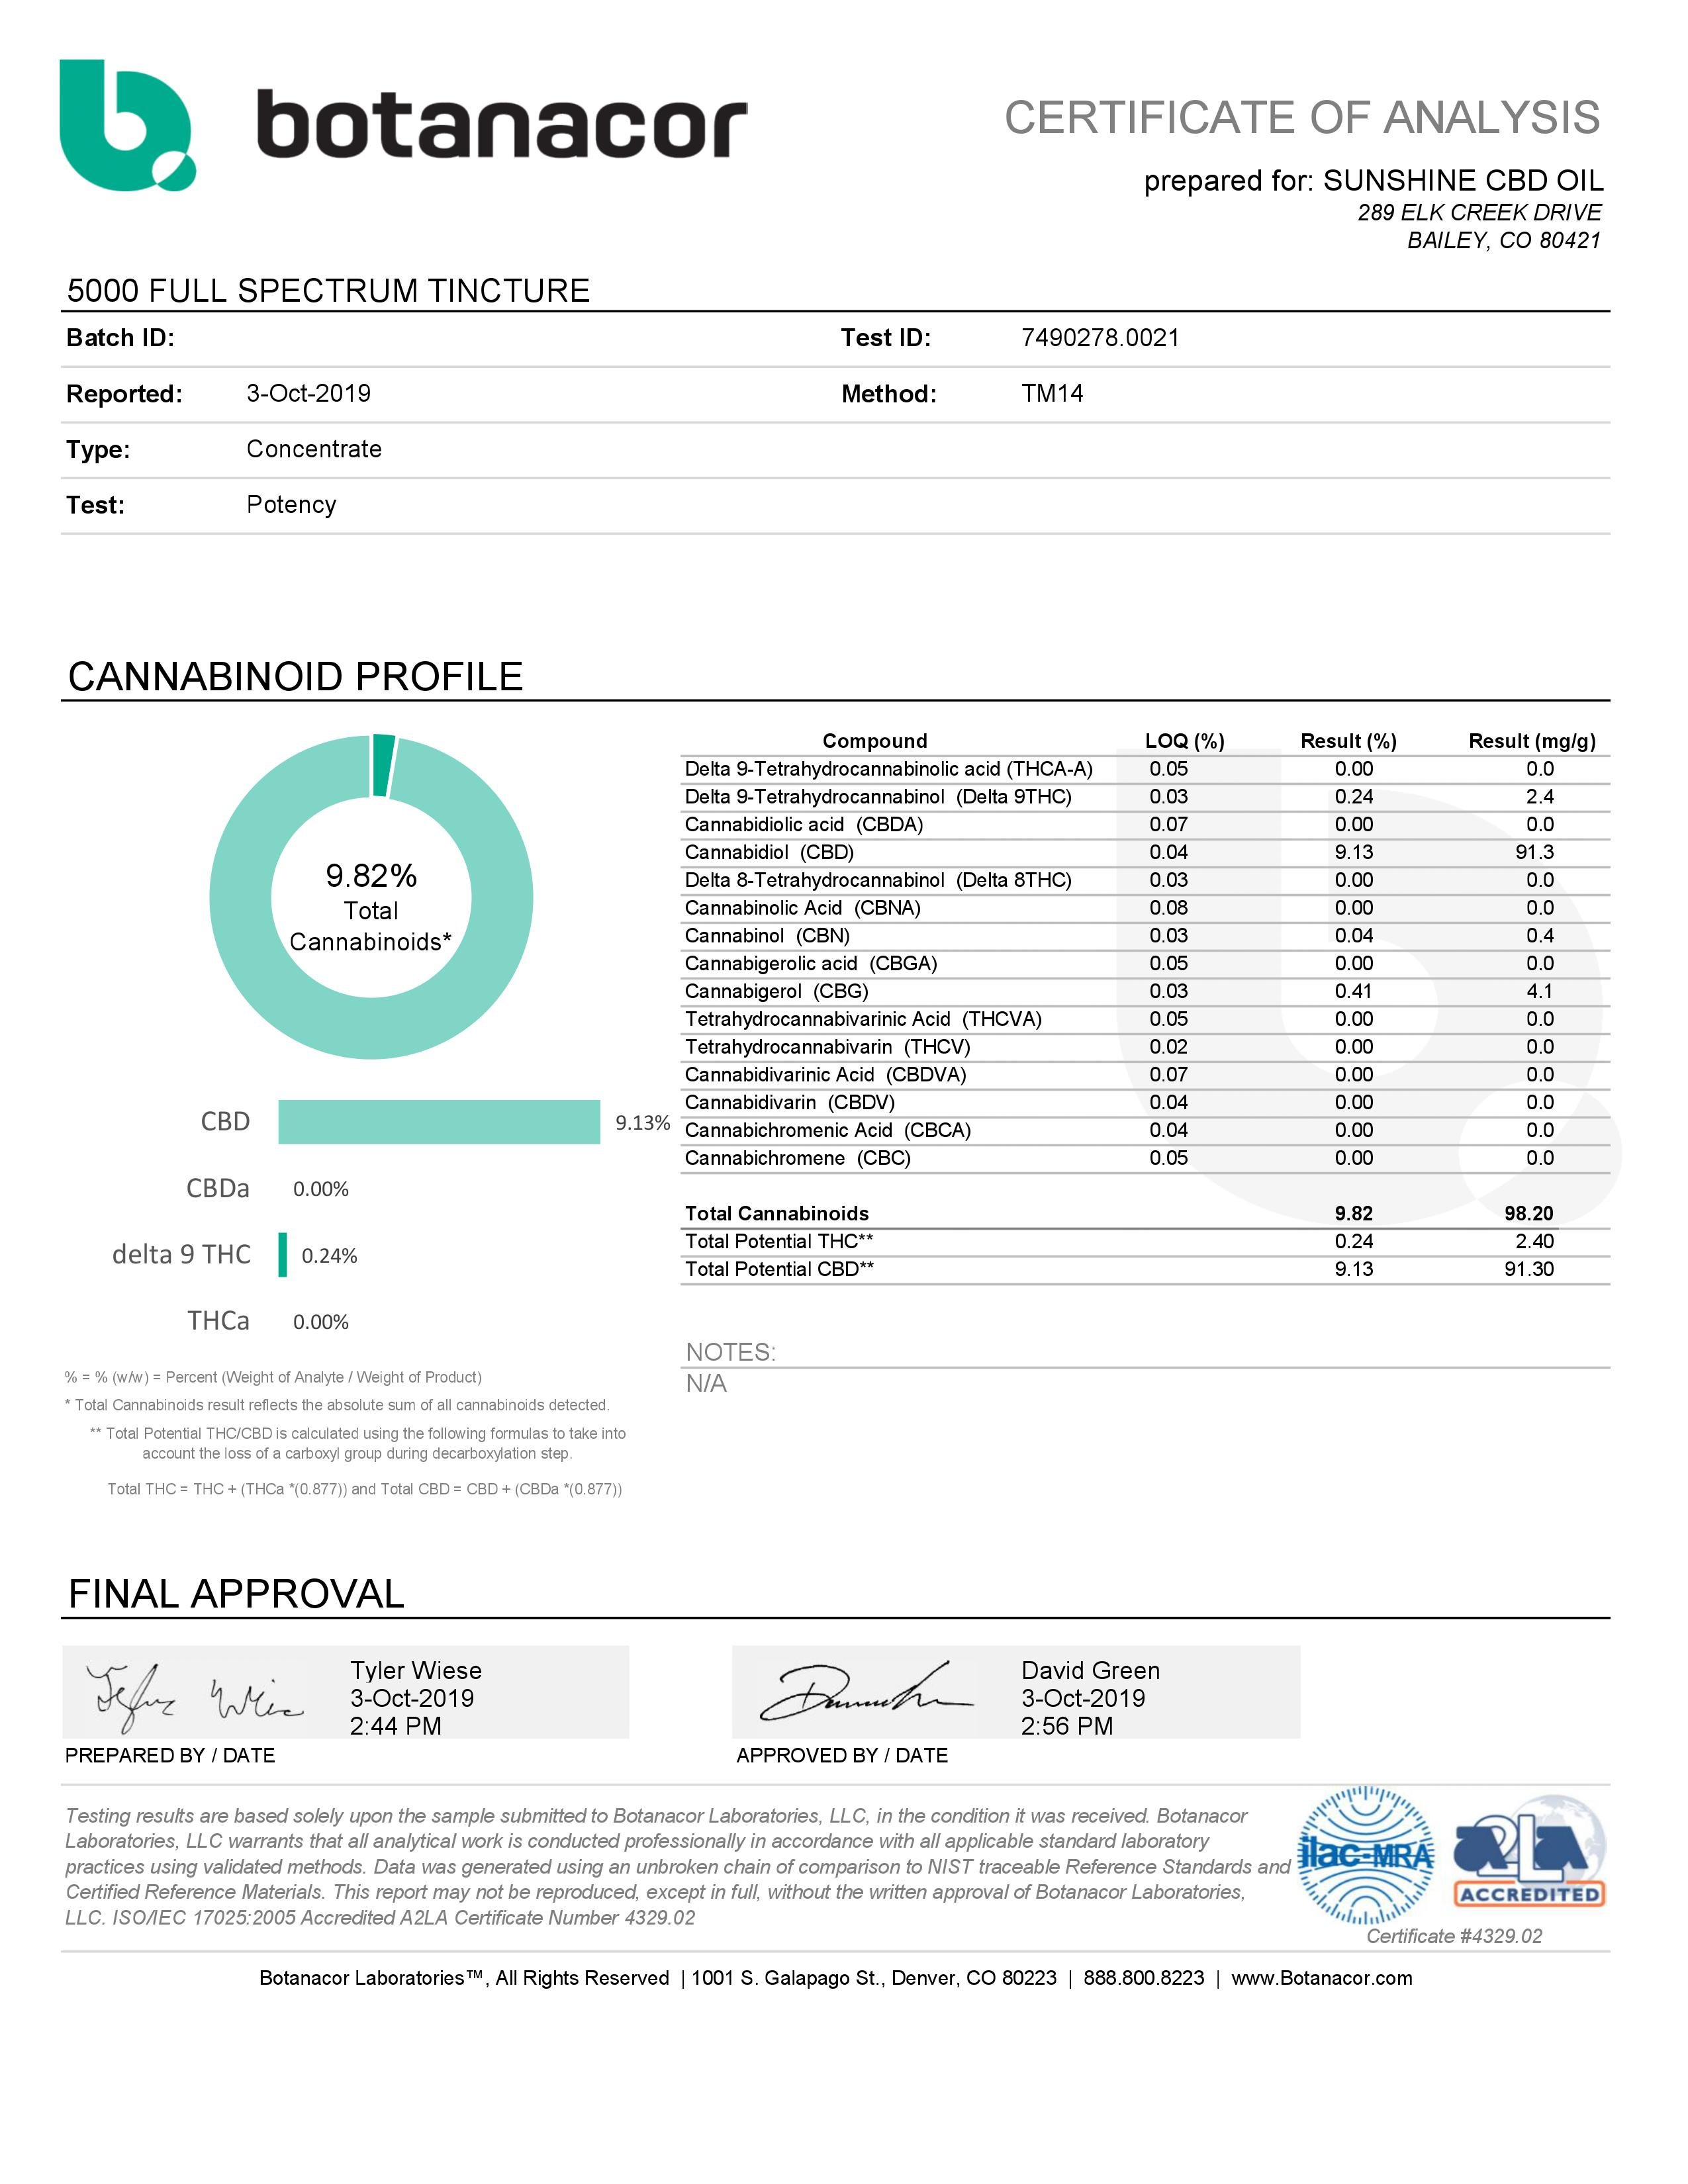 5000mg Full Spec. Potency Test